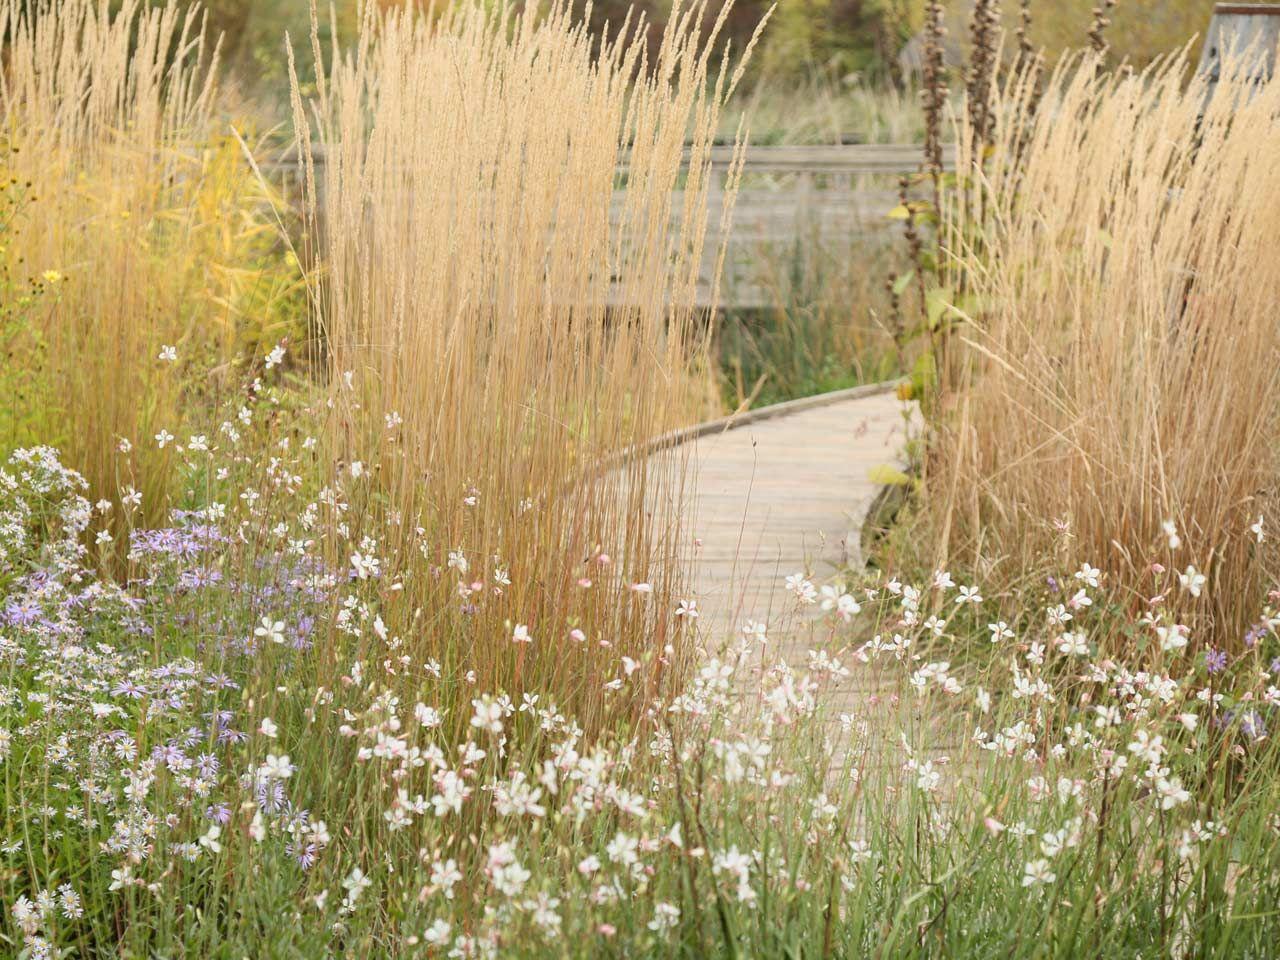 London Wetland Centre Rain nigel dunnett - Google Search ...